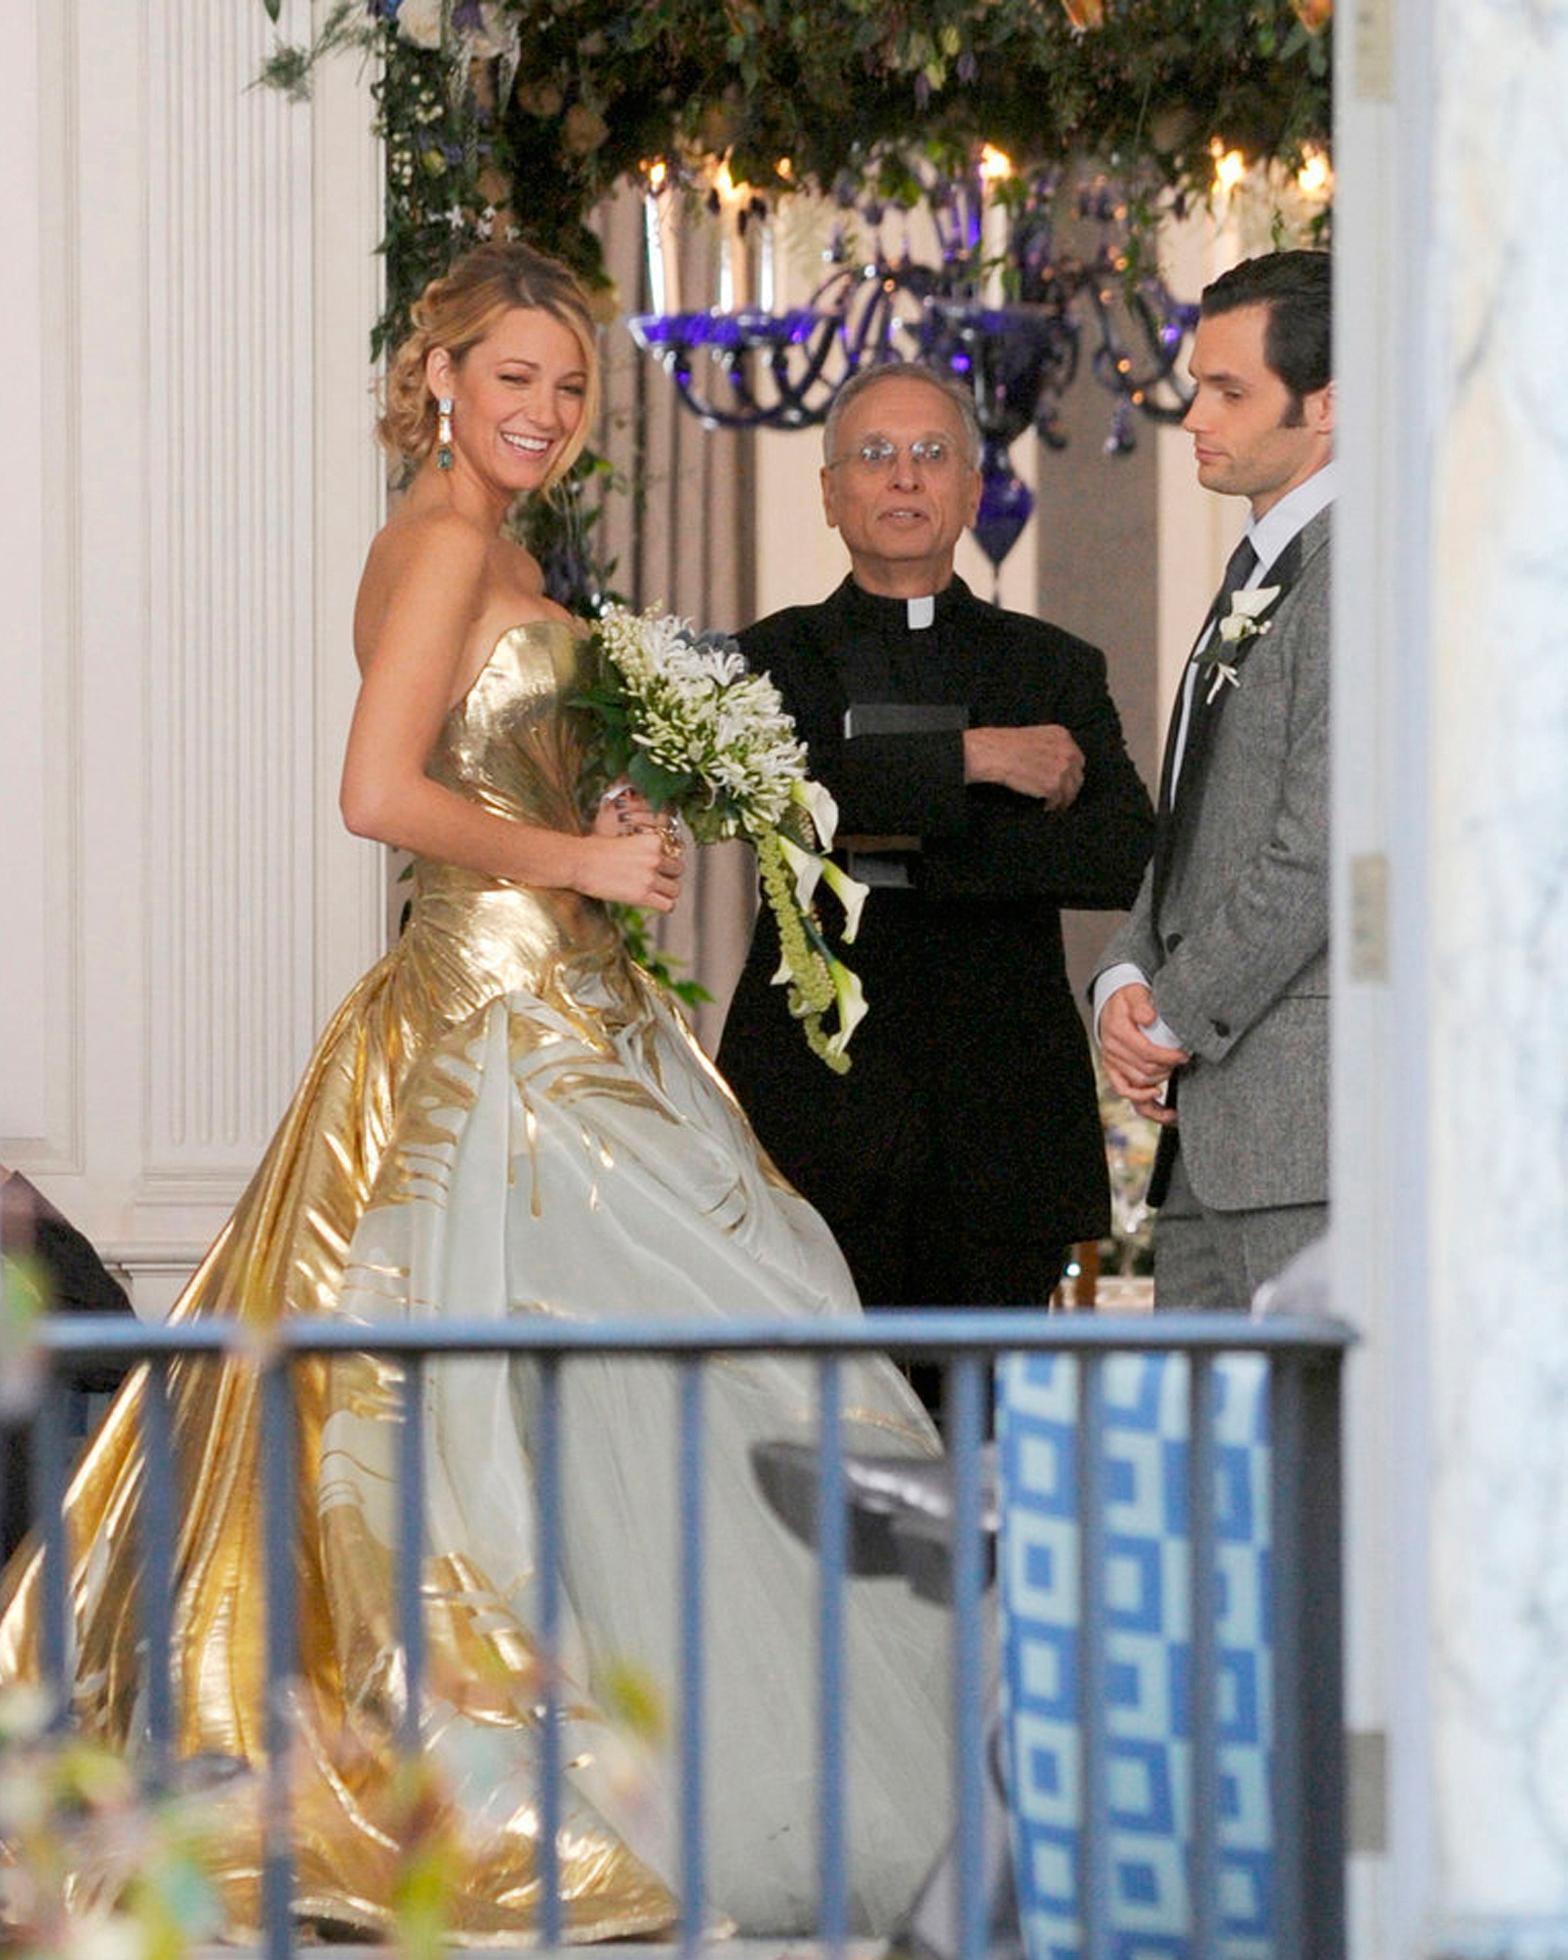 tv-wedding-dresses-serena-gossip-girl-wedding-1115.jpg